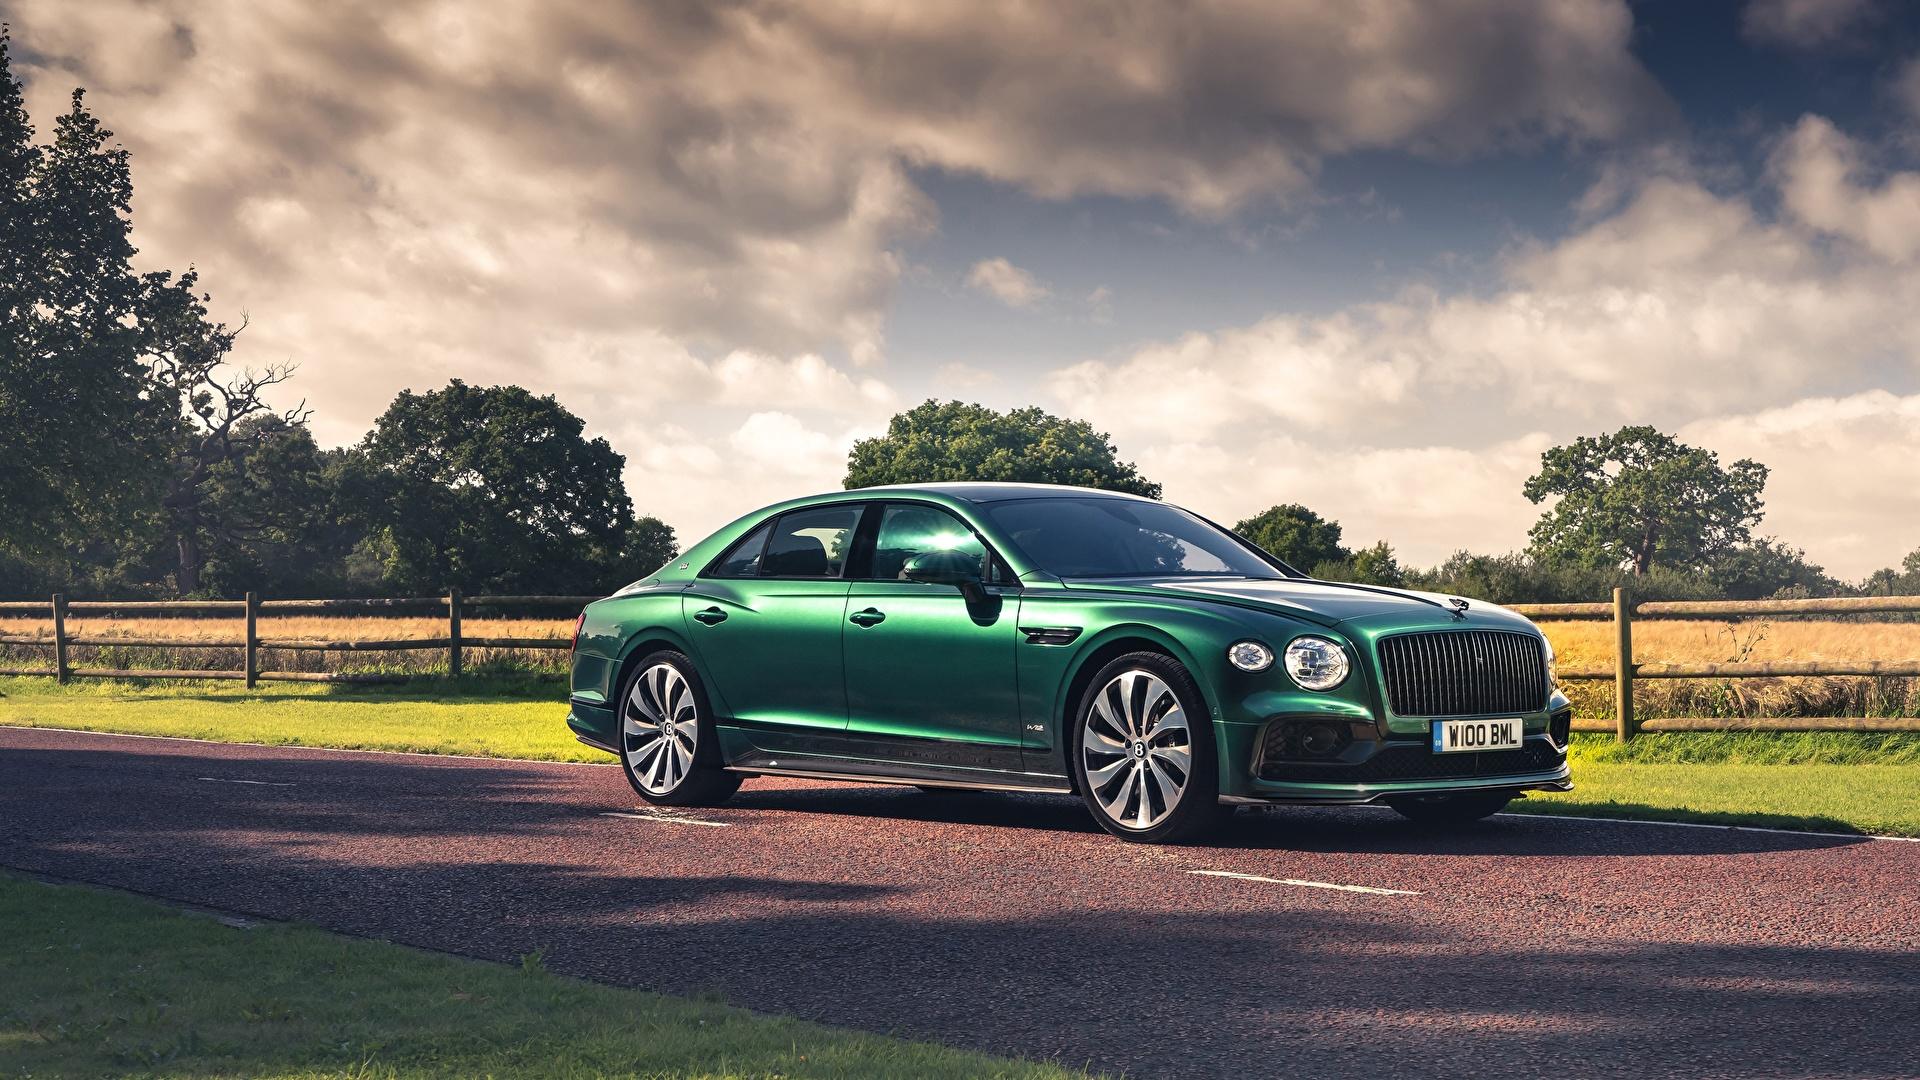 Foto Bentley Flying Spur, Styling Specification, UK-spec, 2020 Berlina Verde macchina Vista laterale 1920x1080 Auto Accanto macchine automobile autovettura